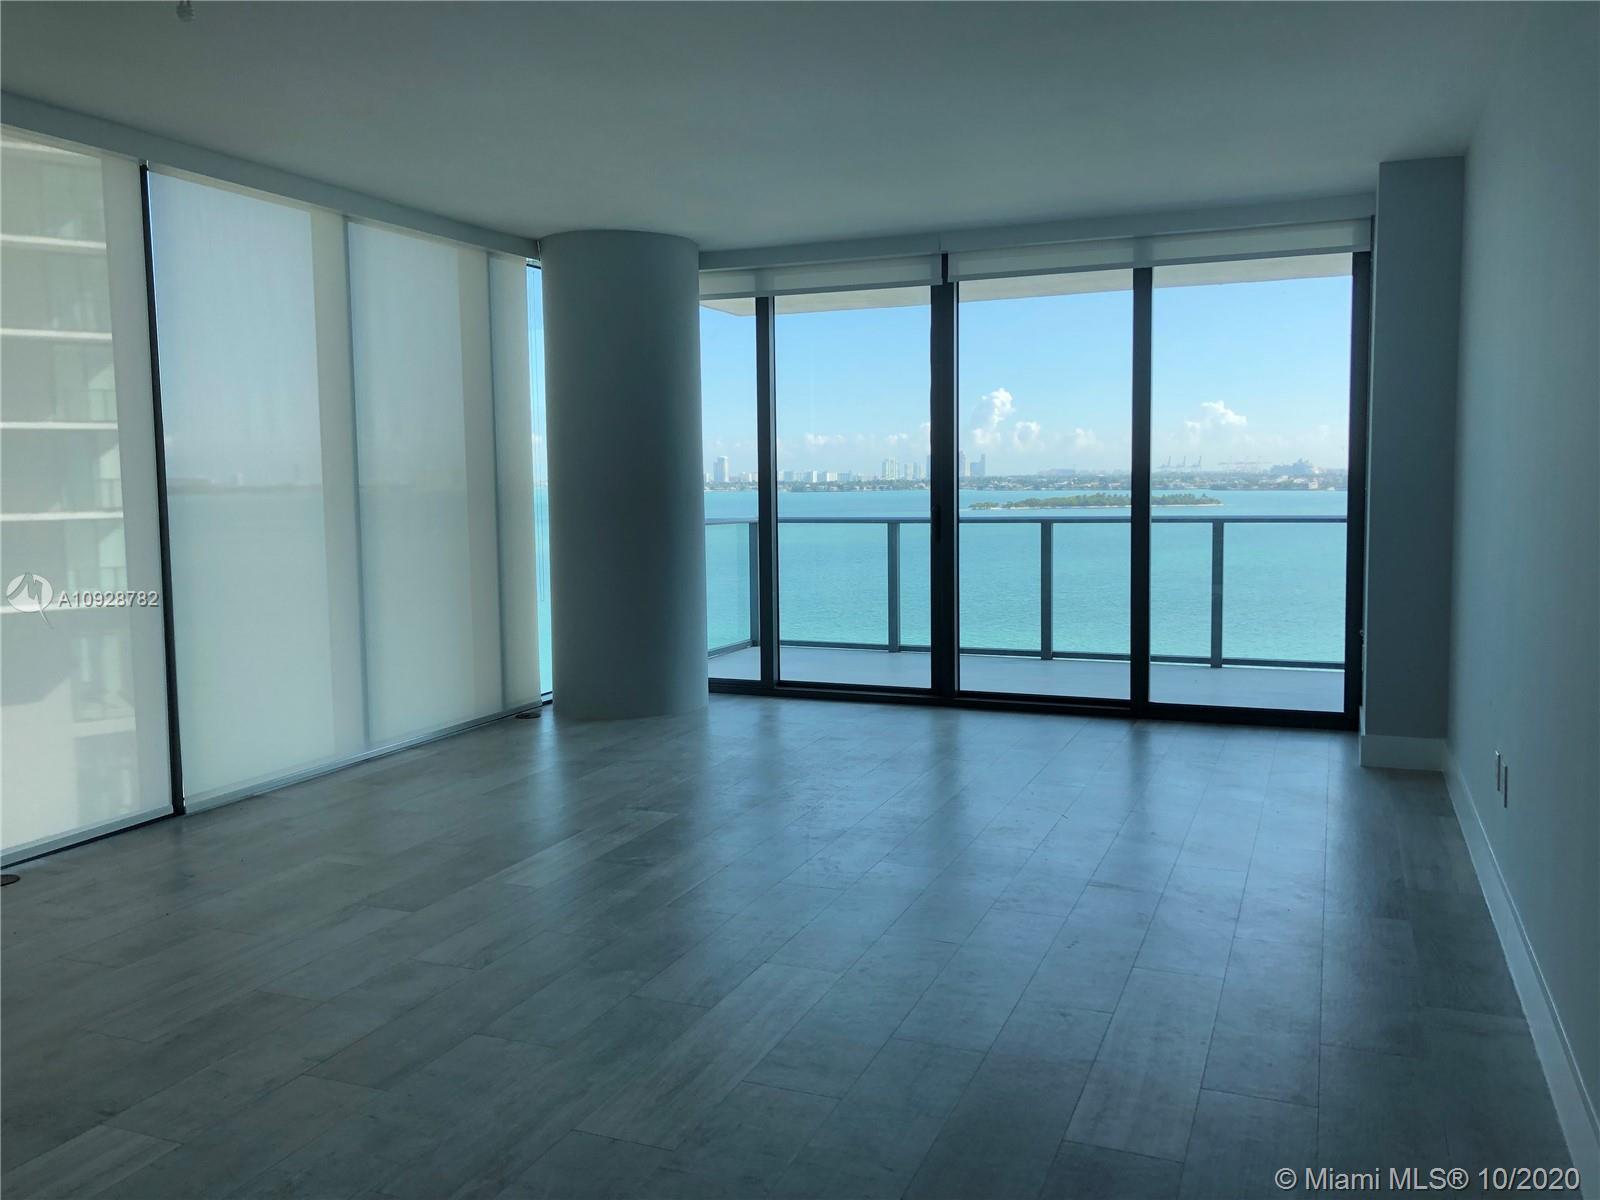 One bedroom, 1 Den, 2 bathroom unit at Paraiso Bay. Stunning bay views from 11th floor unit. Upgrade